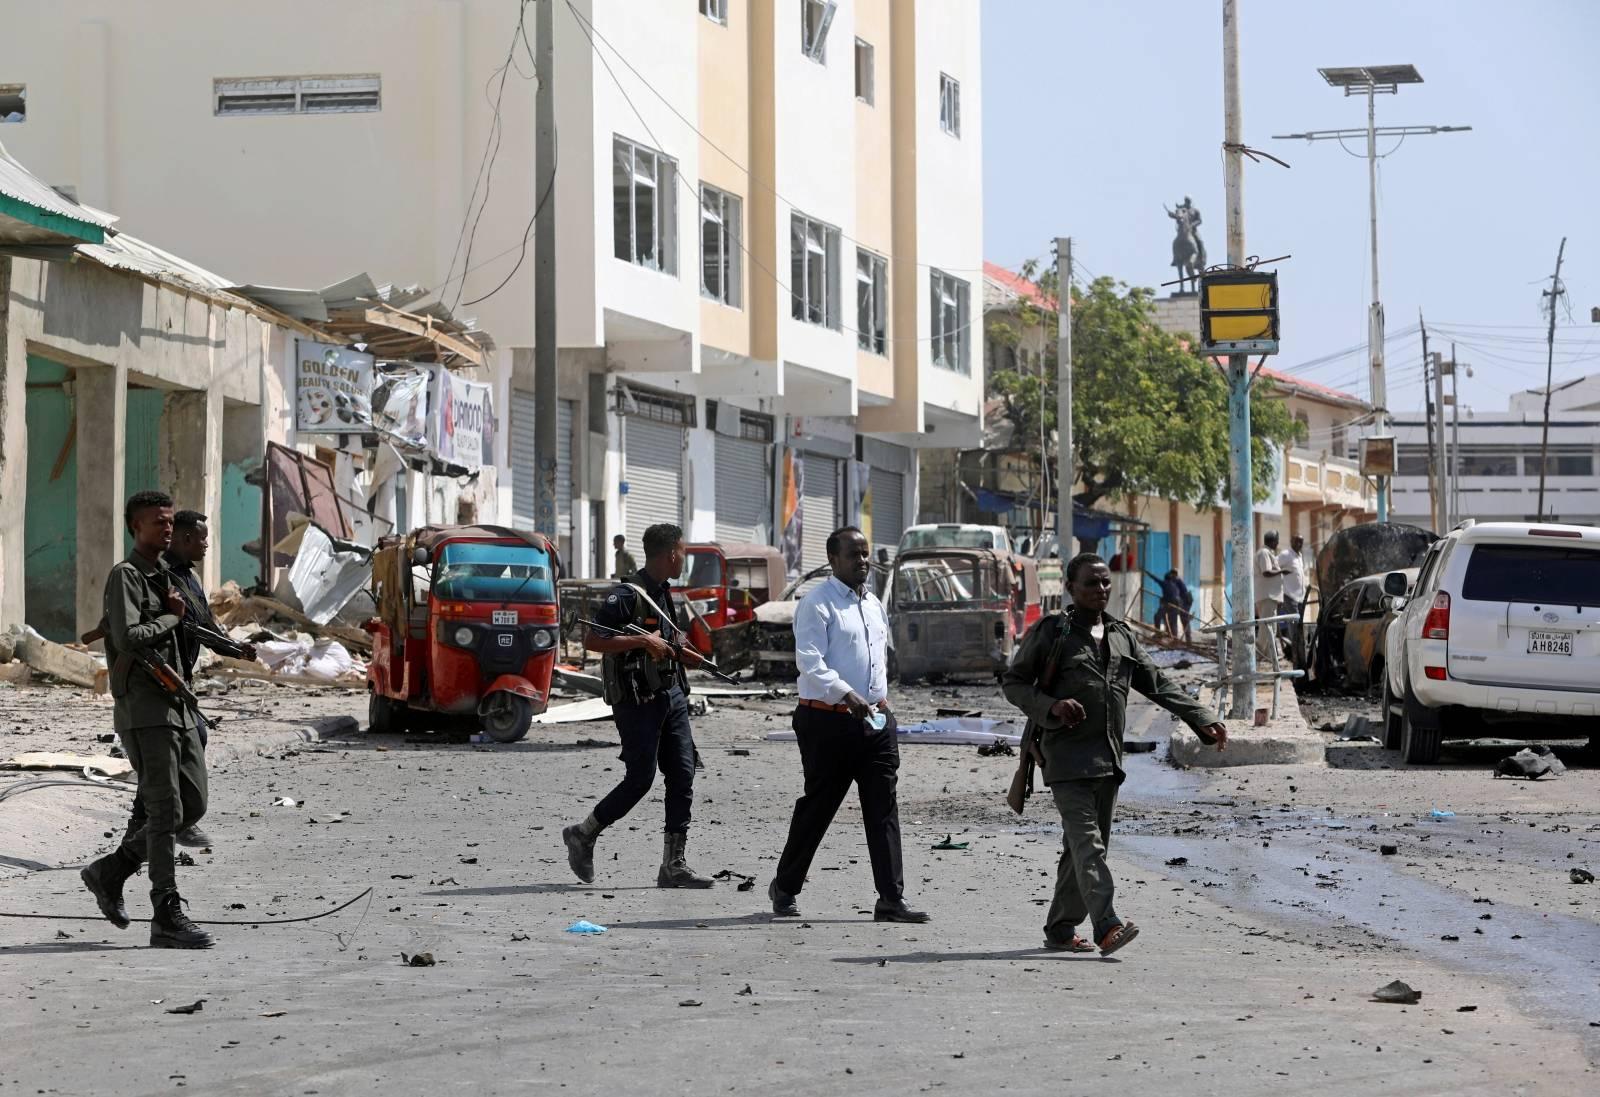 Somali policemen secure the scene of a bomb explosion at the Maka al-Mukarama street in Mogadishu